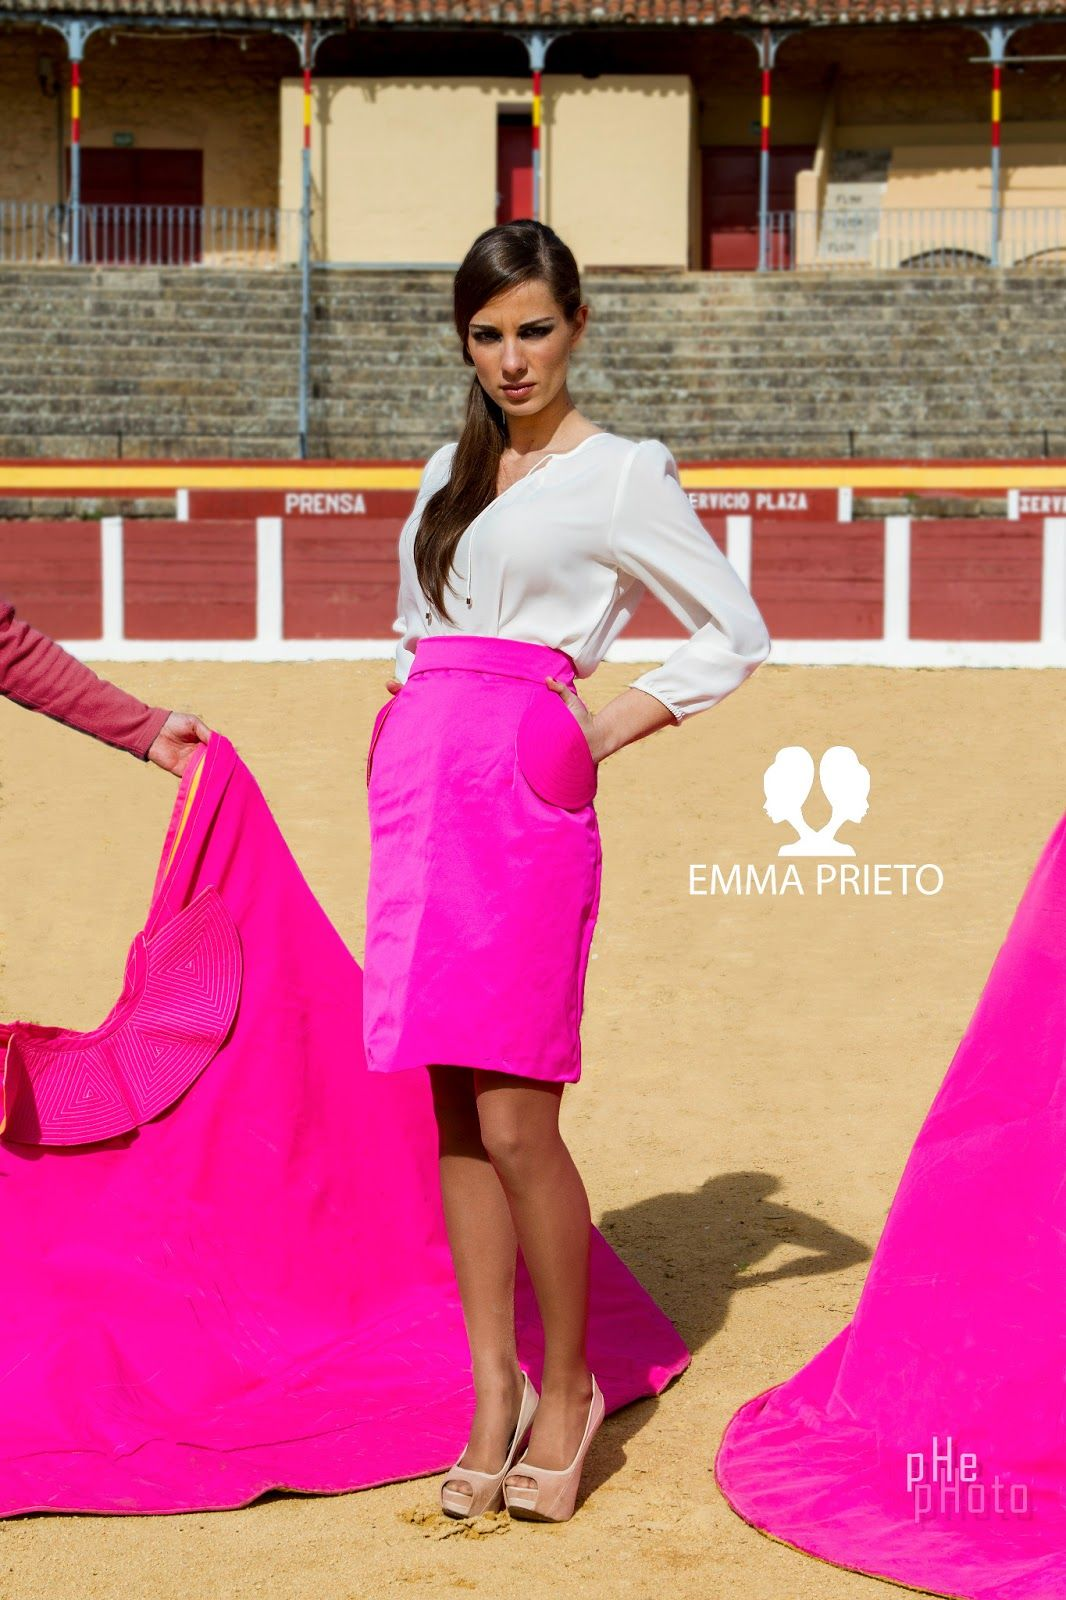 LADY TRAP en los TOROS: Emma Prieto | Life Style Taurino | Pinterest ...